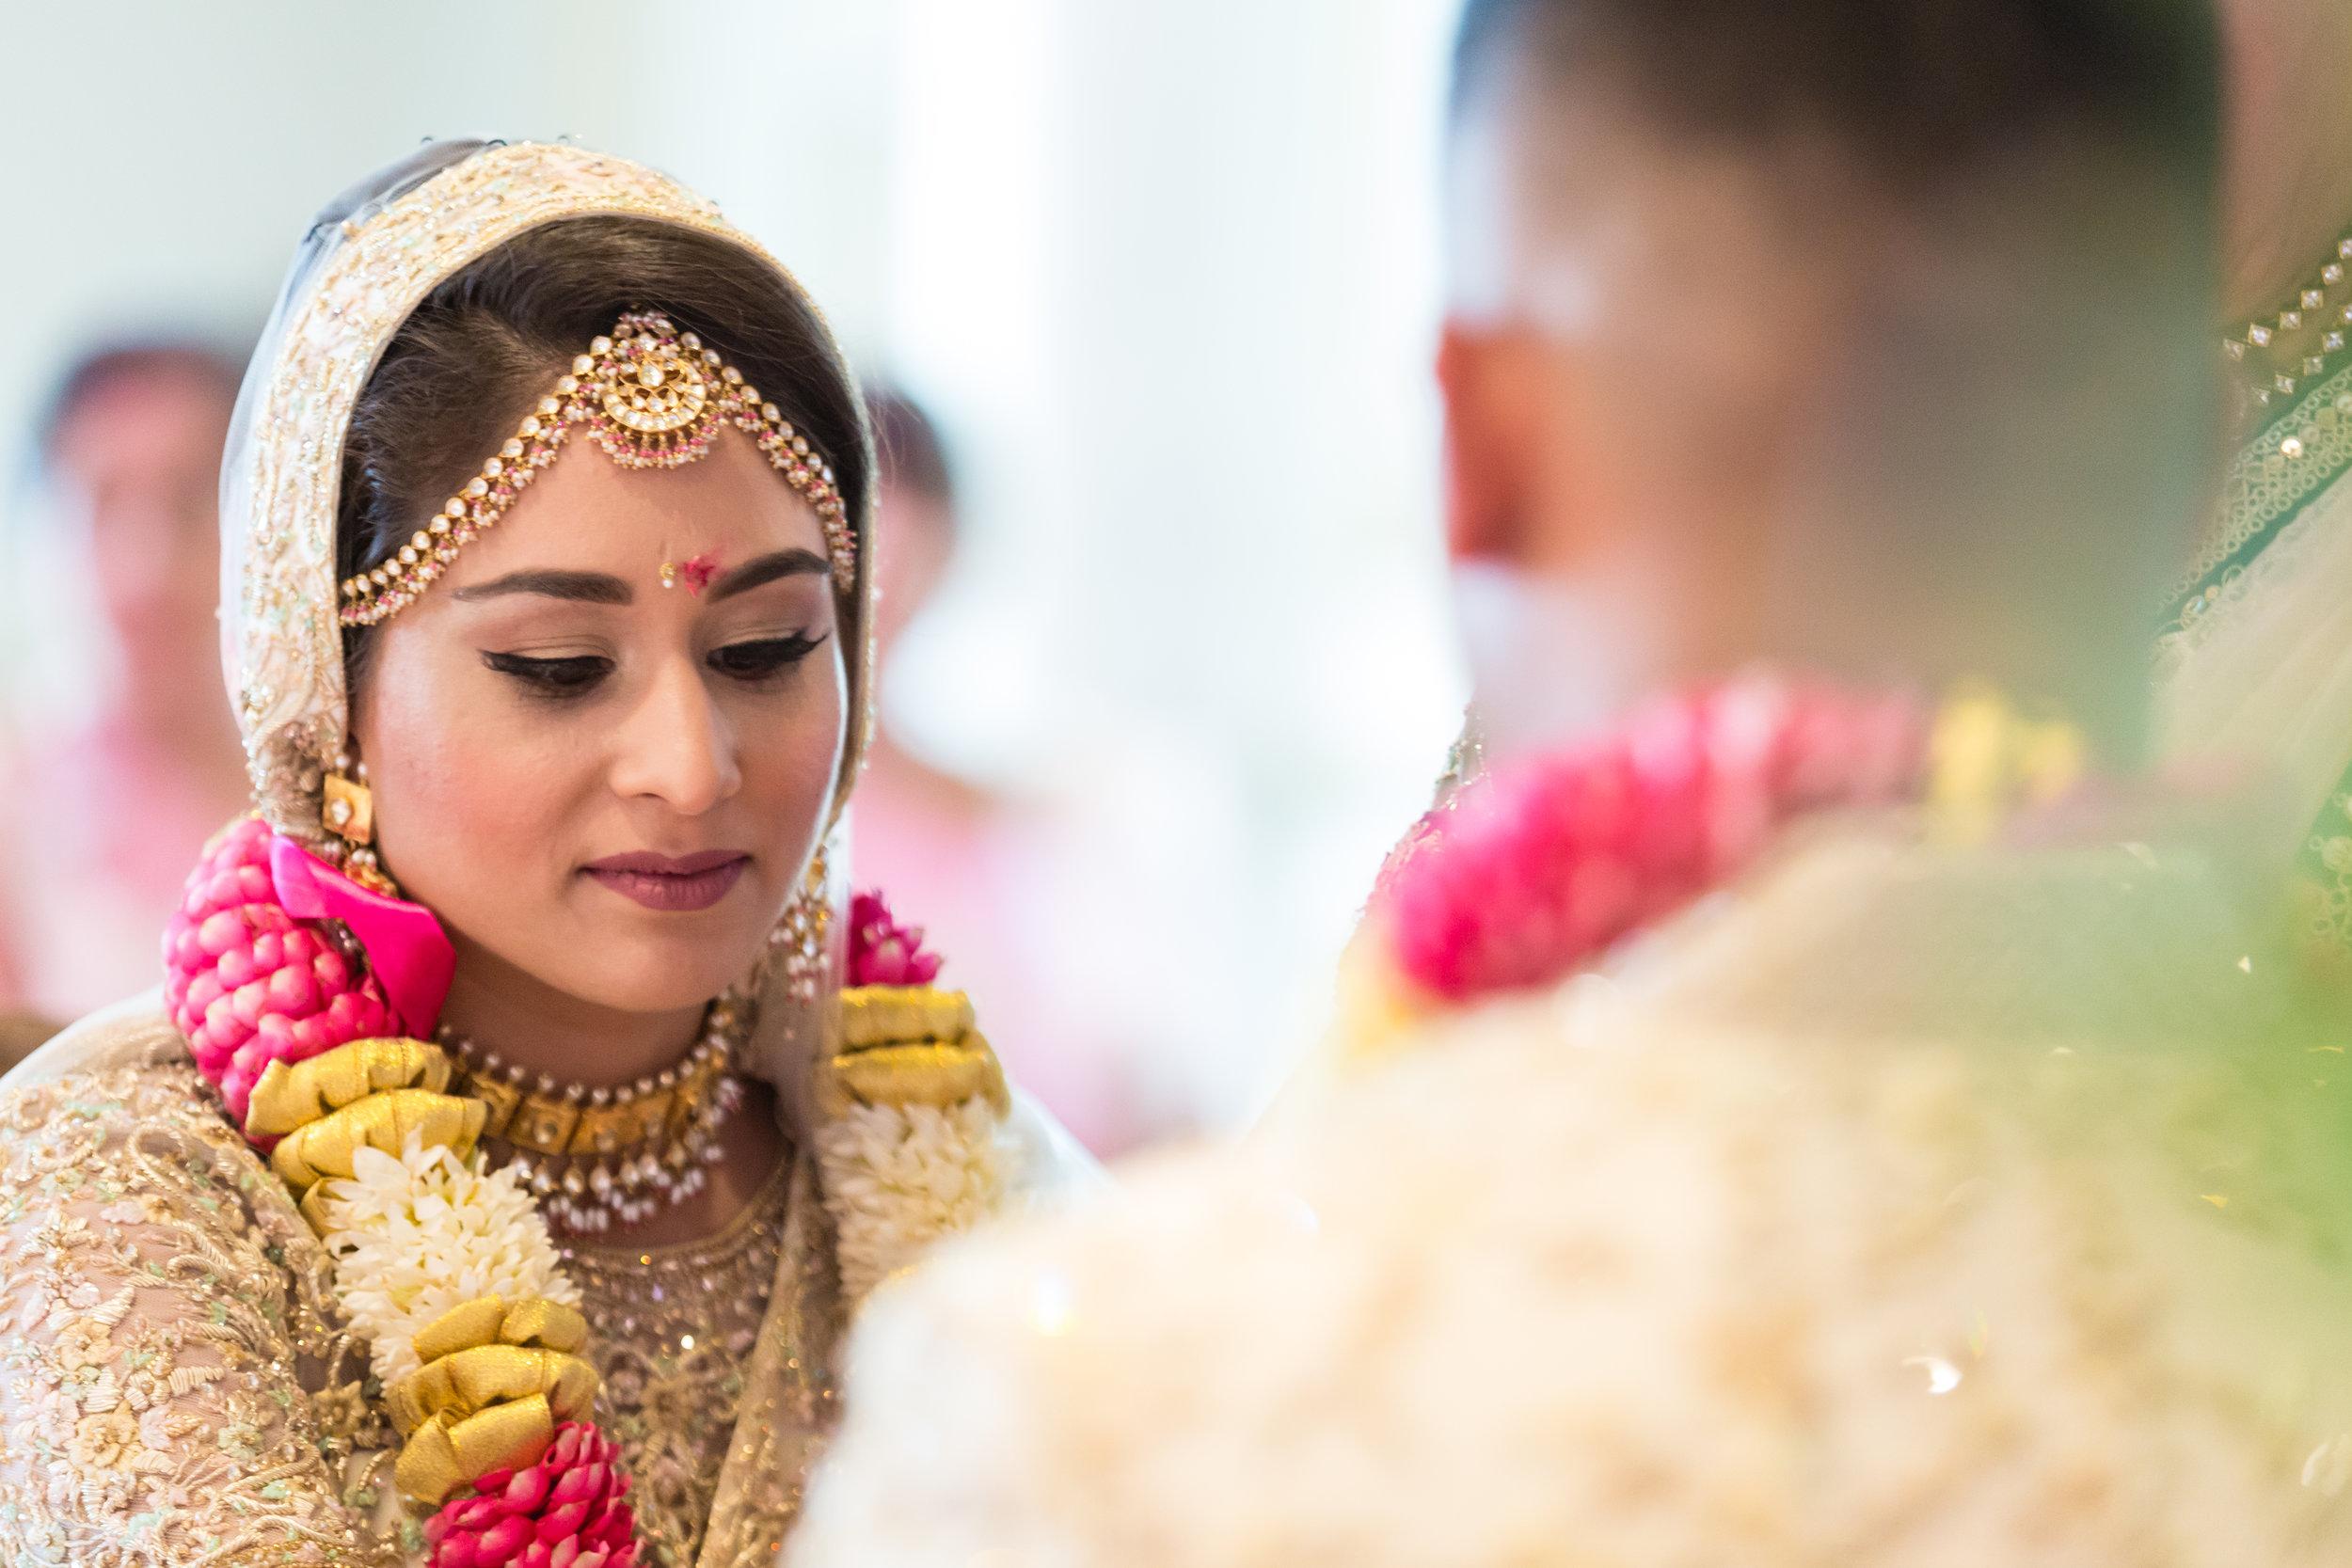 INDIAN WEDDING BRIDE AND GROOM CLOSEUP.jpg